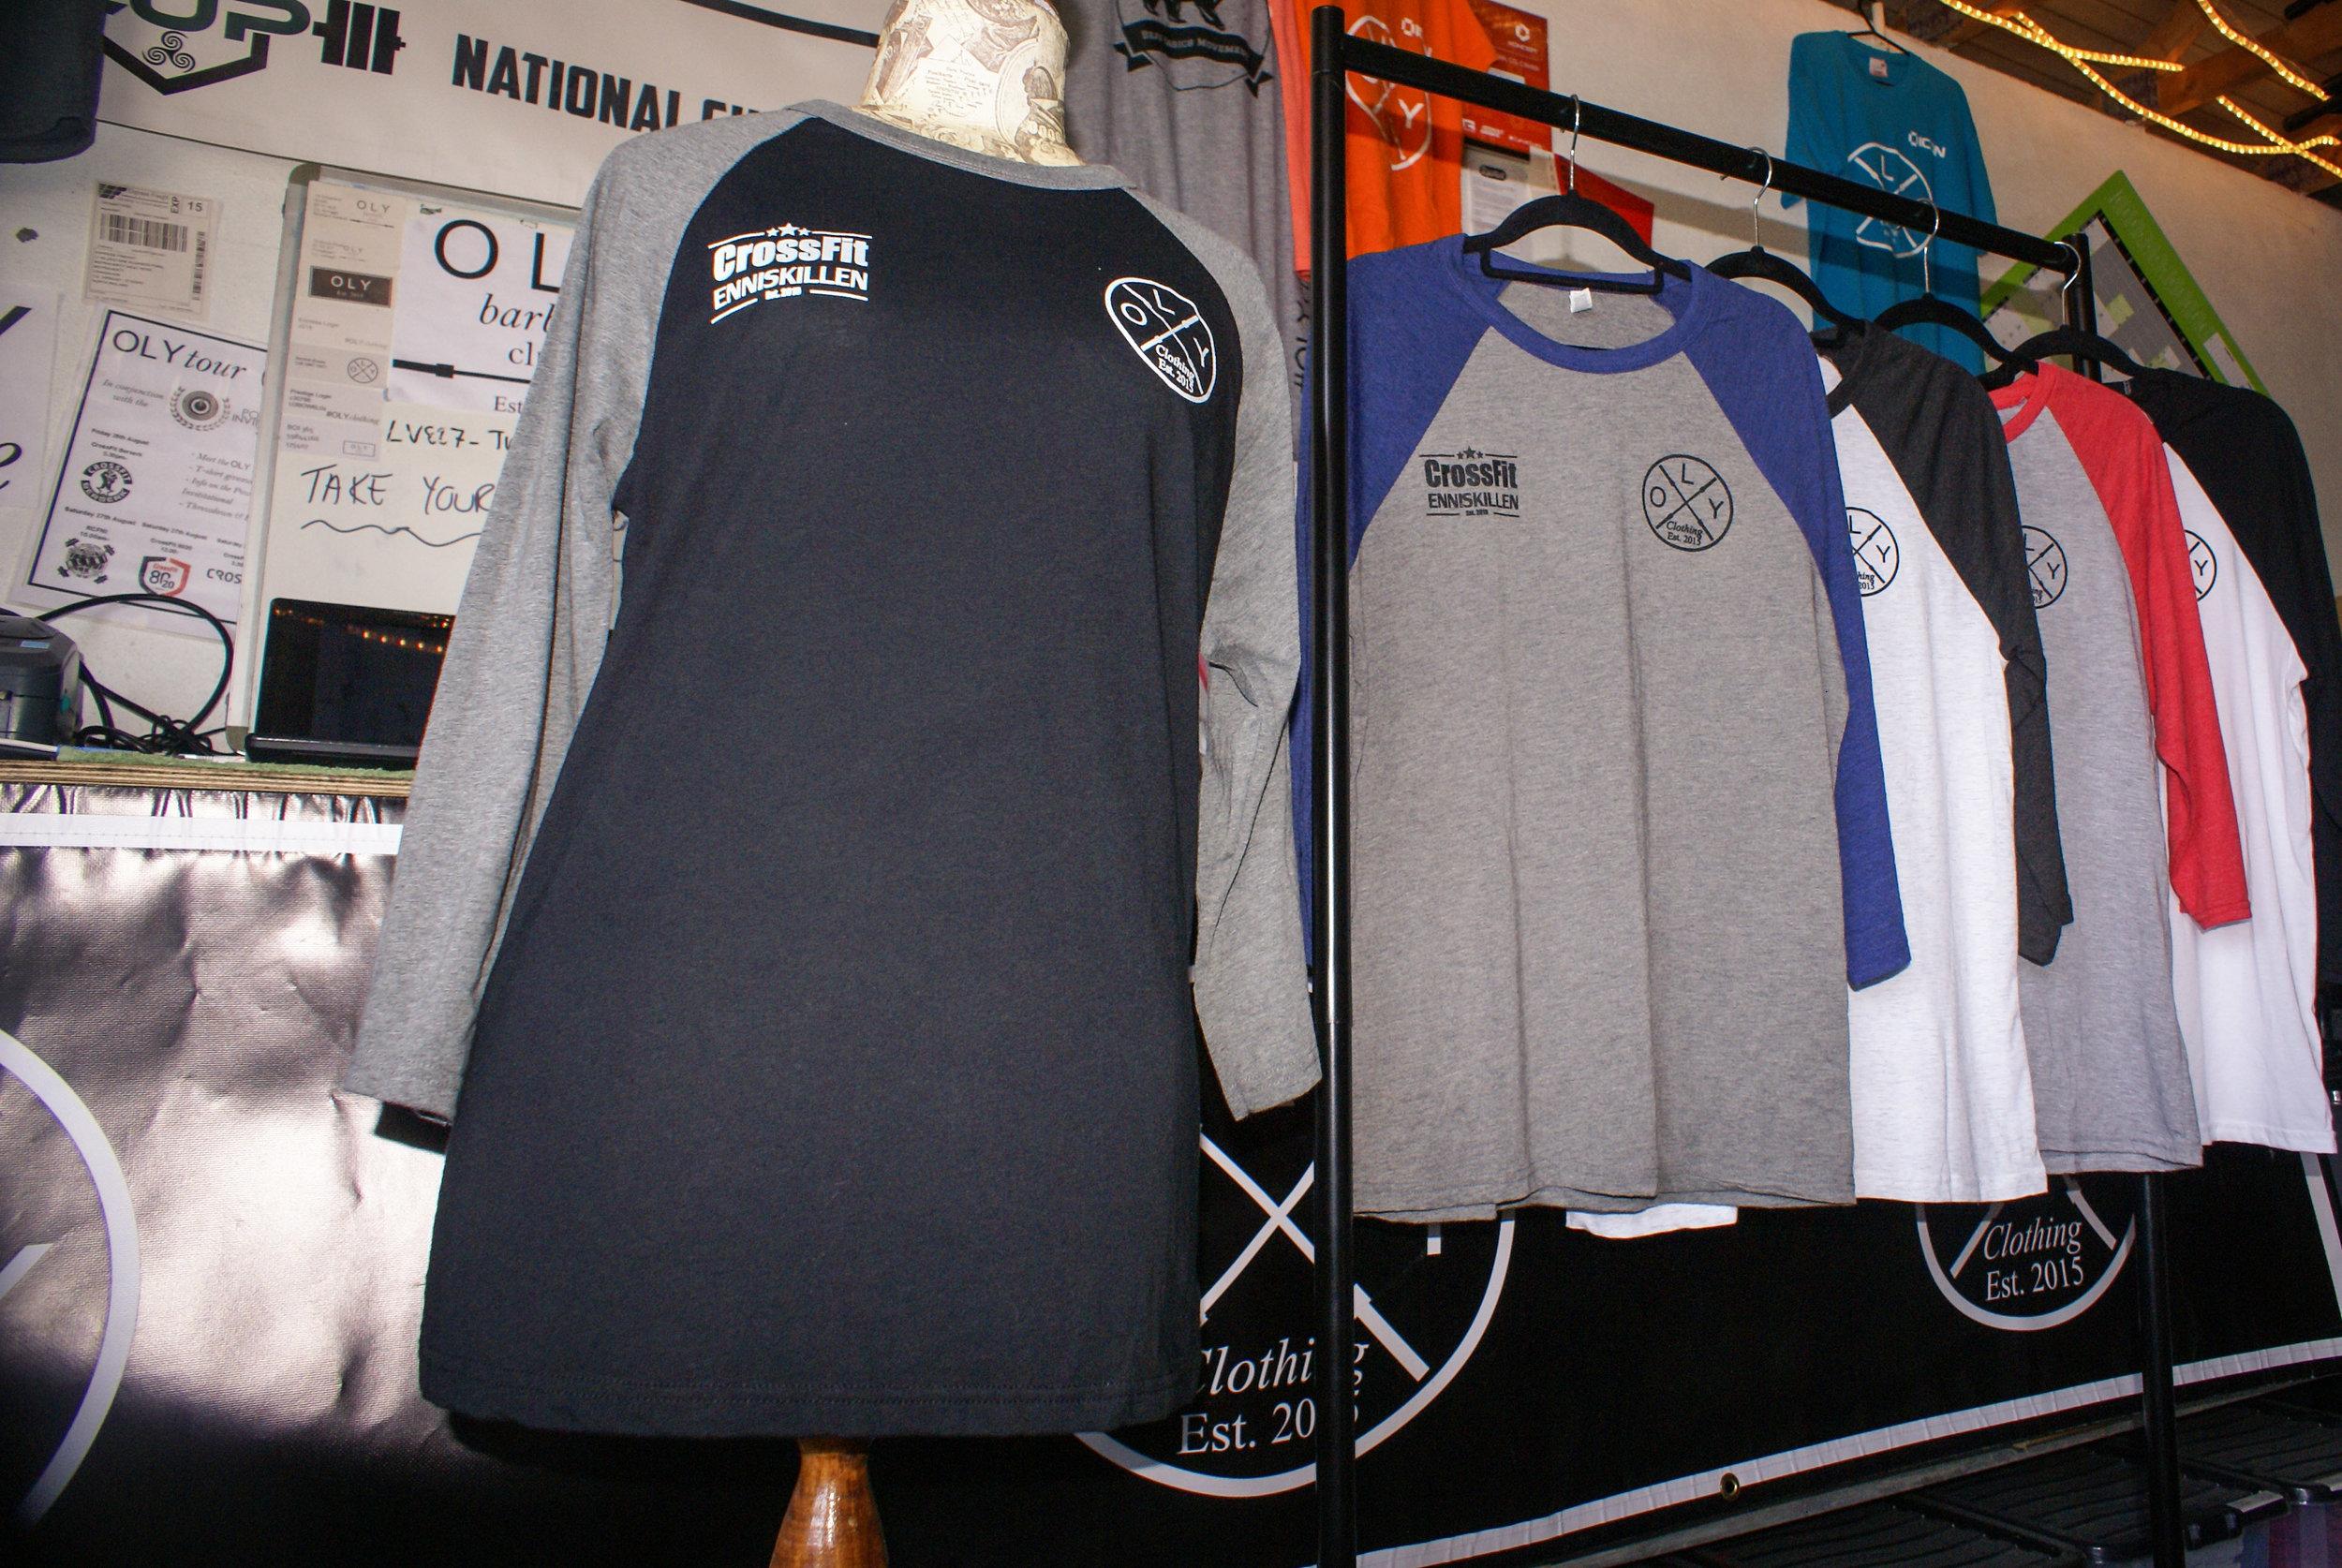 CrossFit-Eniskillen-CA-LR-5.jpg